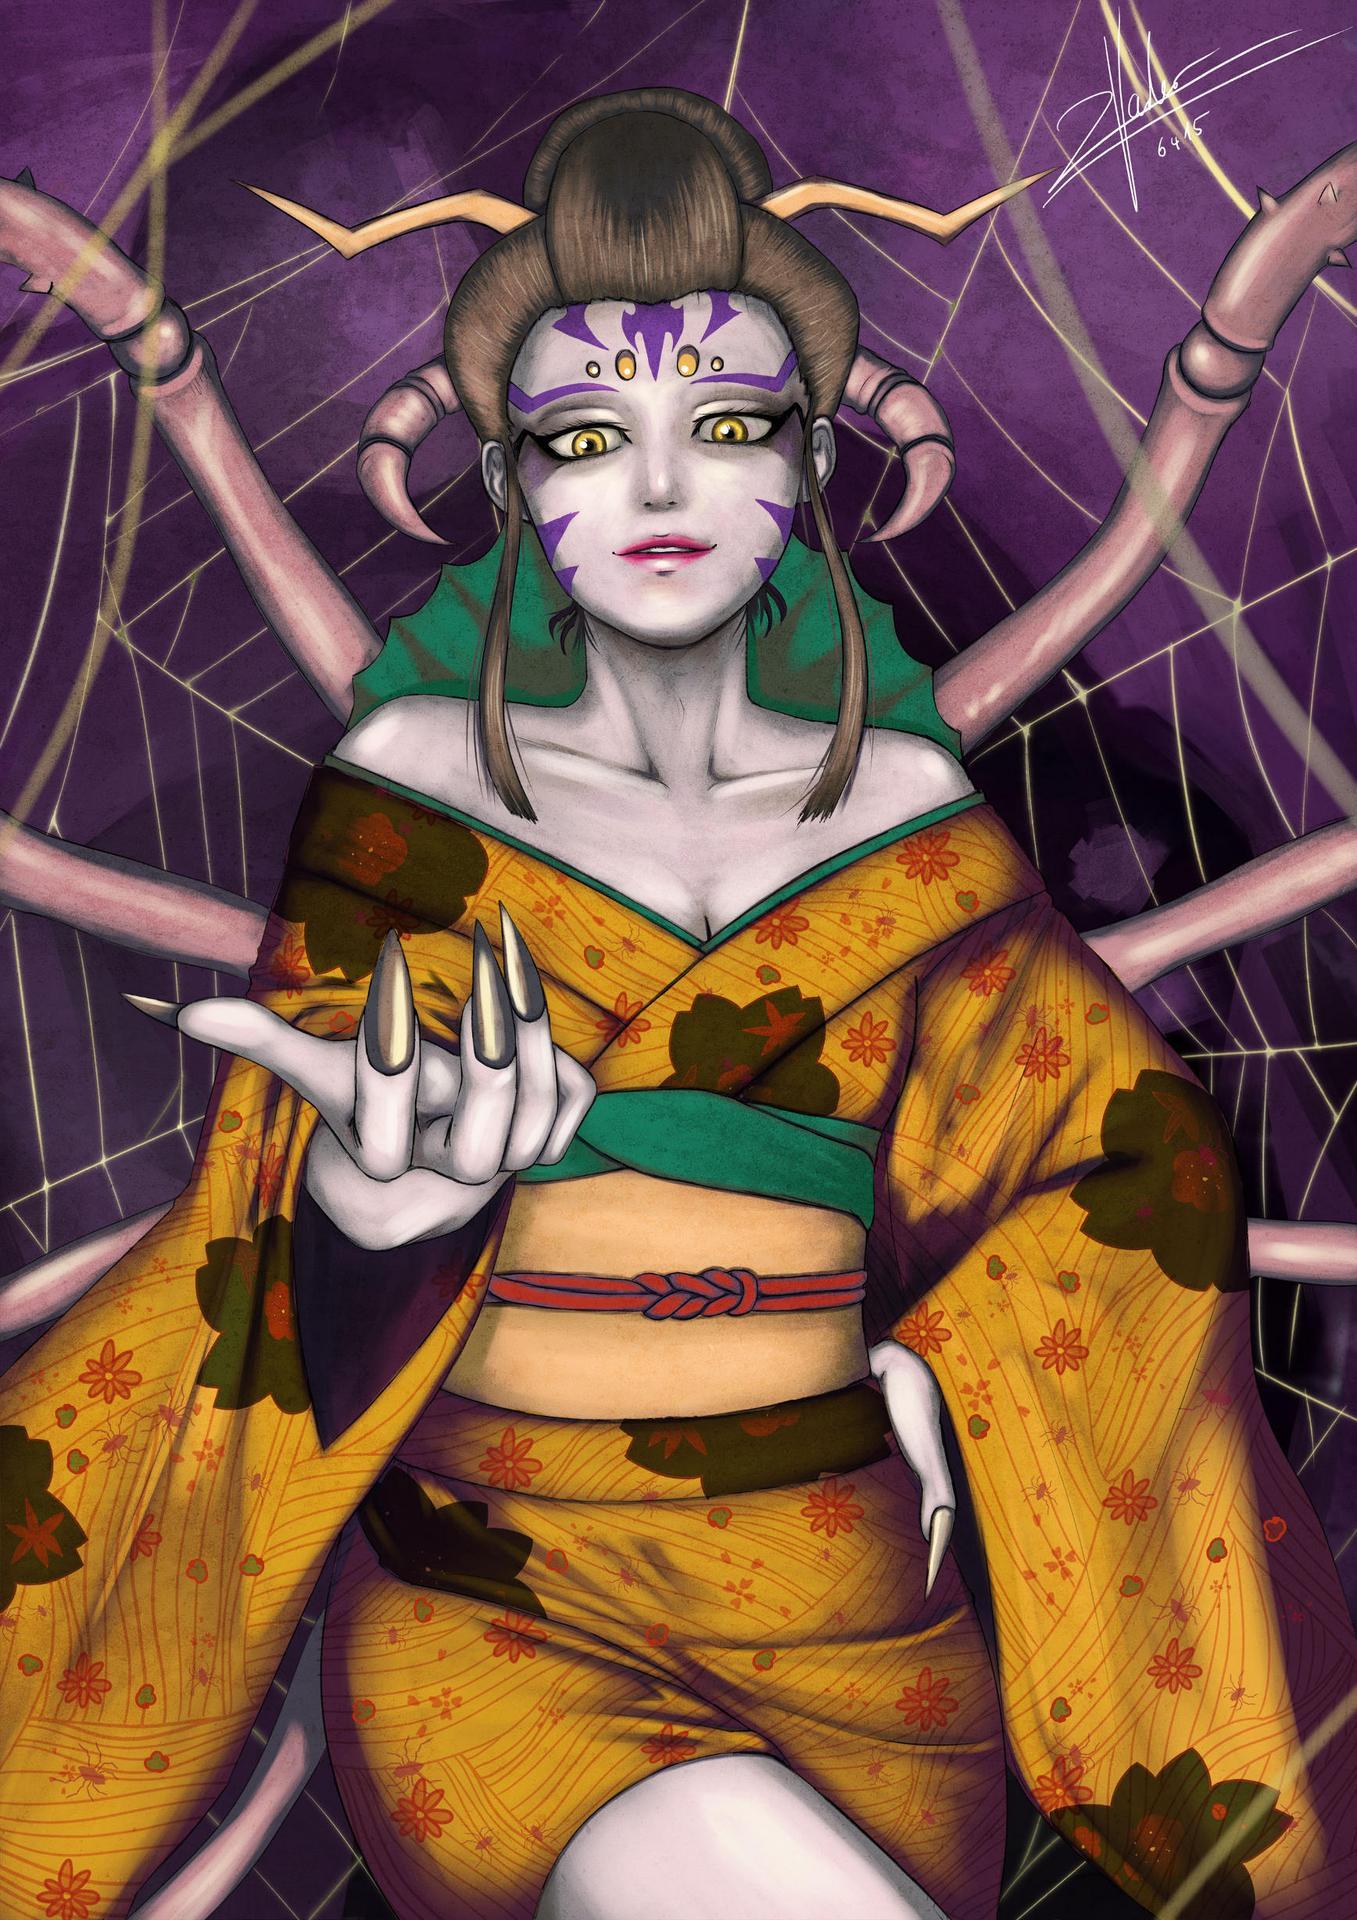 images?q=tbn:ANd9GcQh_l3eQ5xwiPy07kGEXjmjgmBKBRB7H2mRxCGhv1tFWg5c_mWT Ideas For Anime Art Competition 2019 @koolgadgetz.com.info